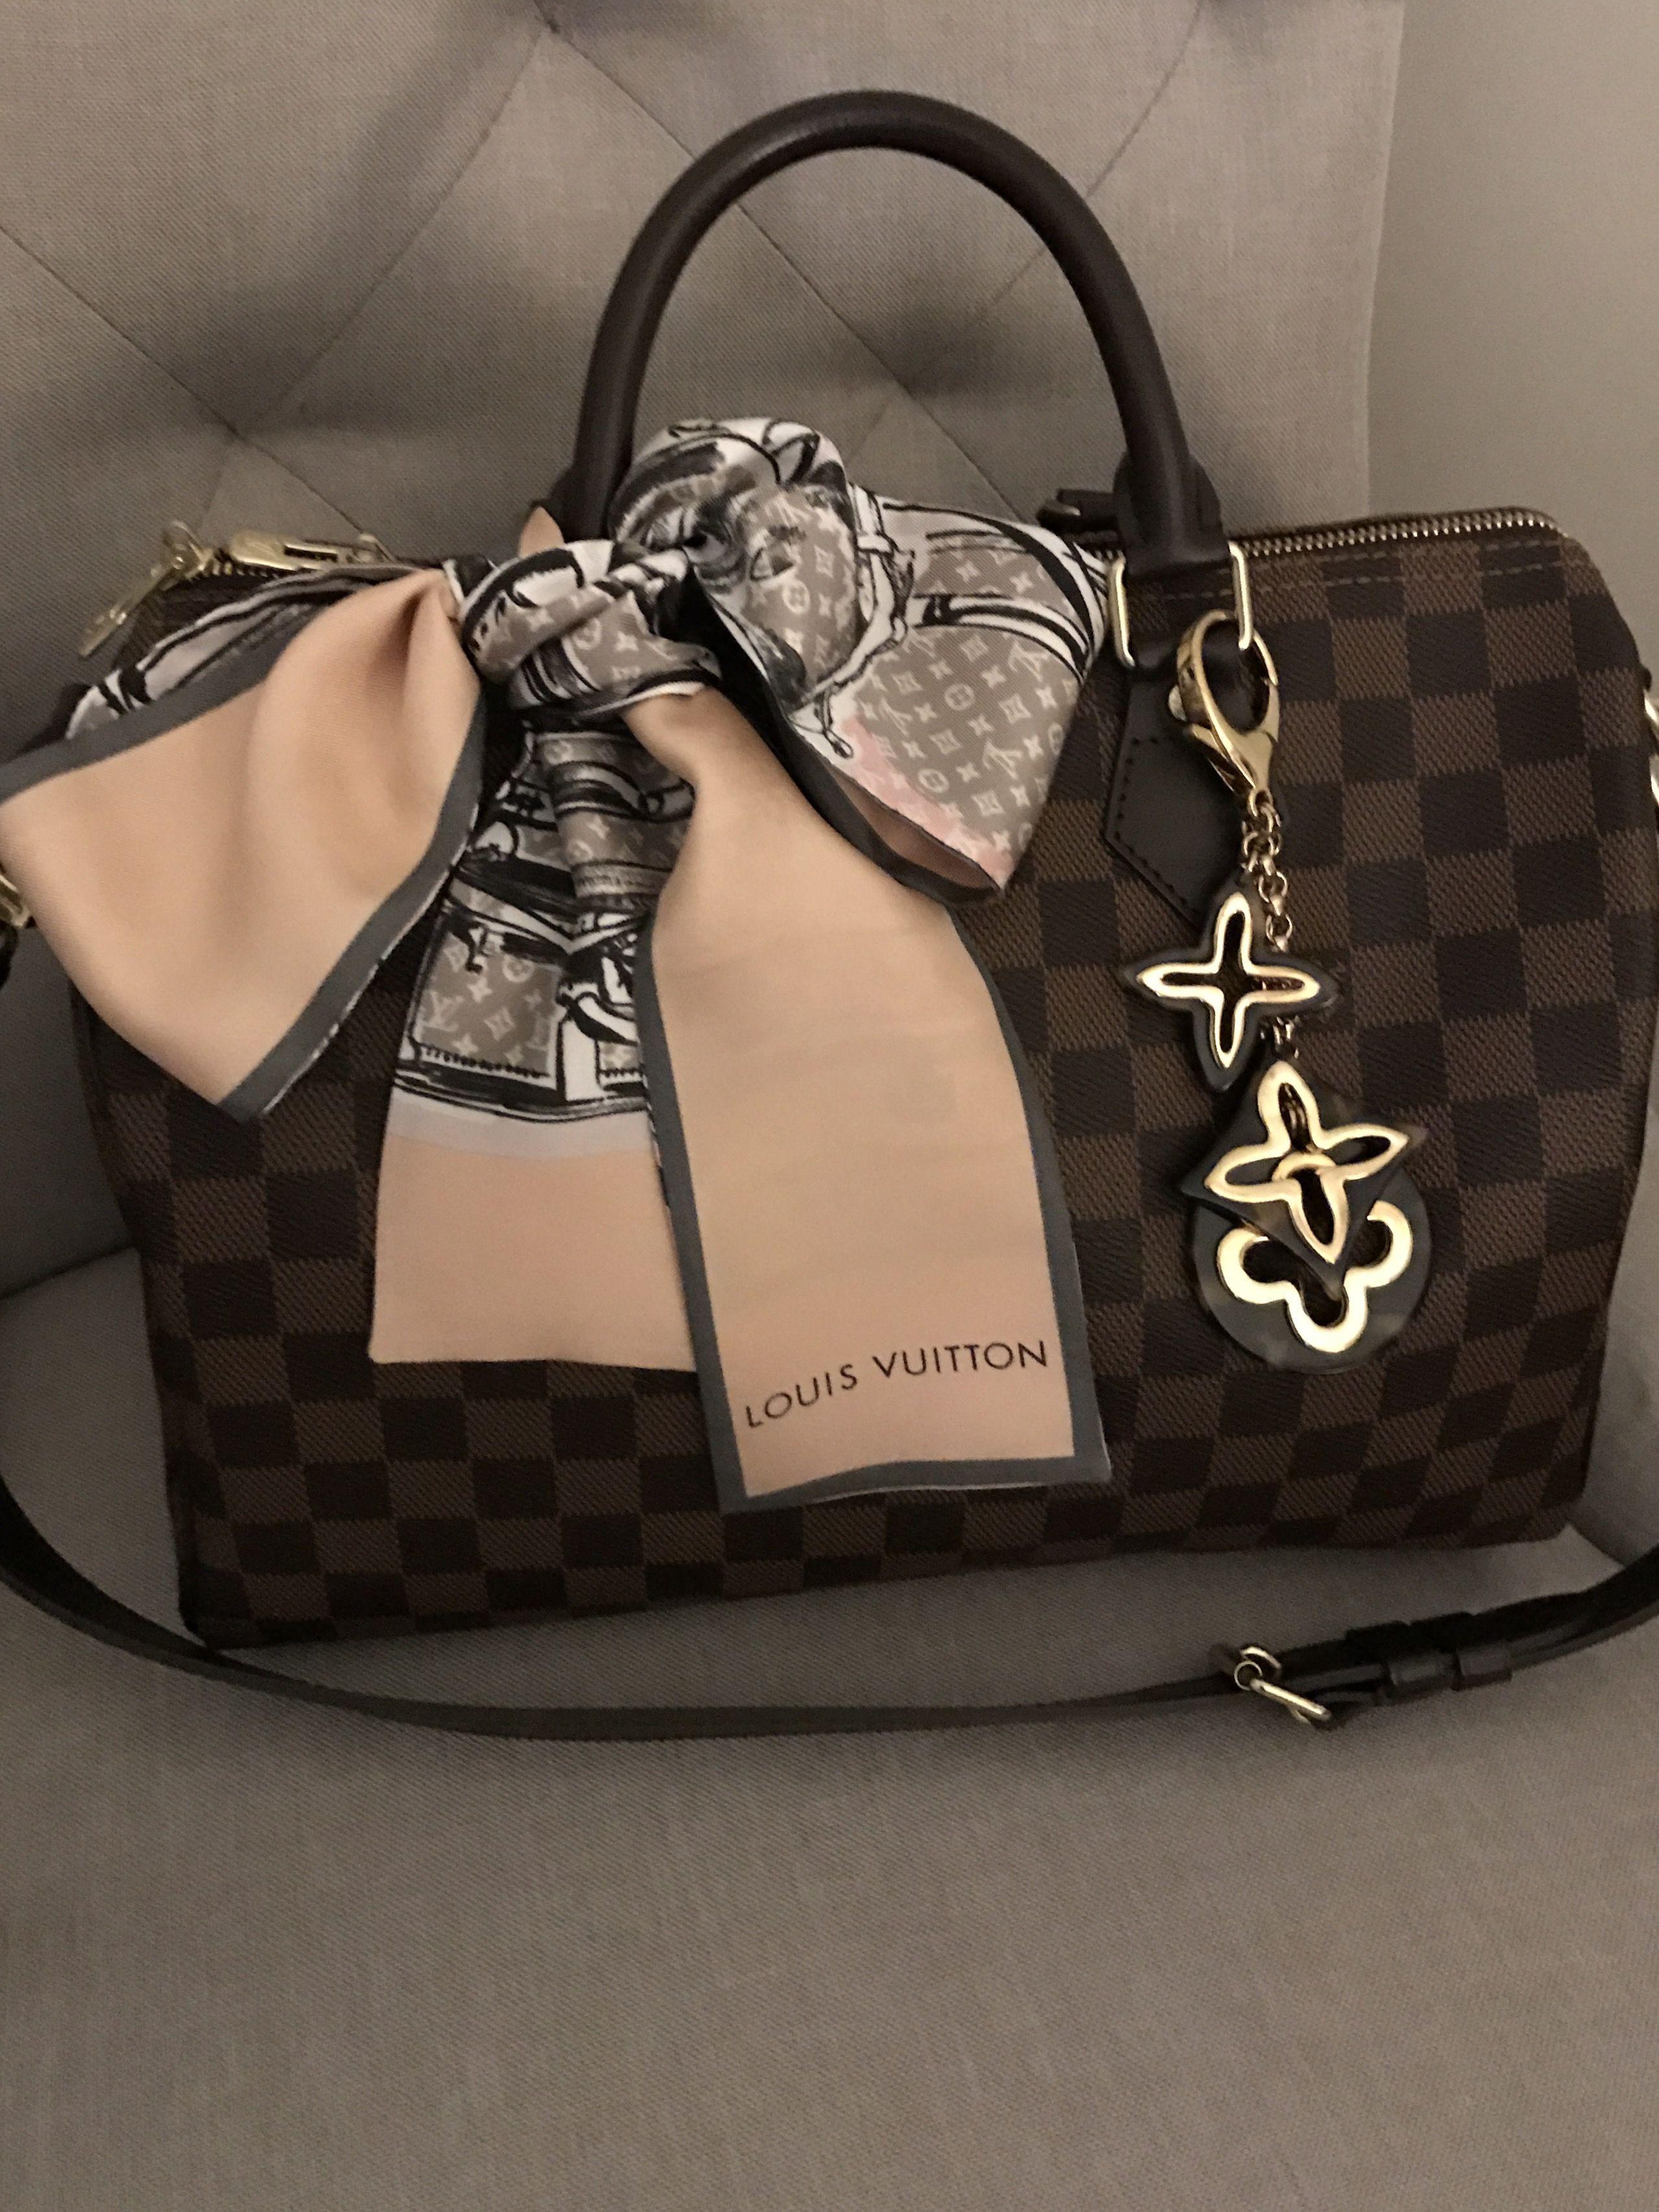 425b80a69 Louis Vuitton speedy b 30 damier ebene.... so pretty with lv bandeau and  charm #purseslv